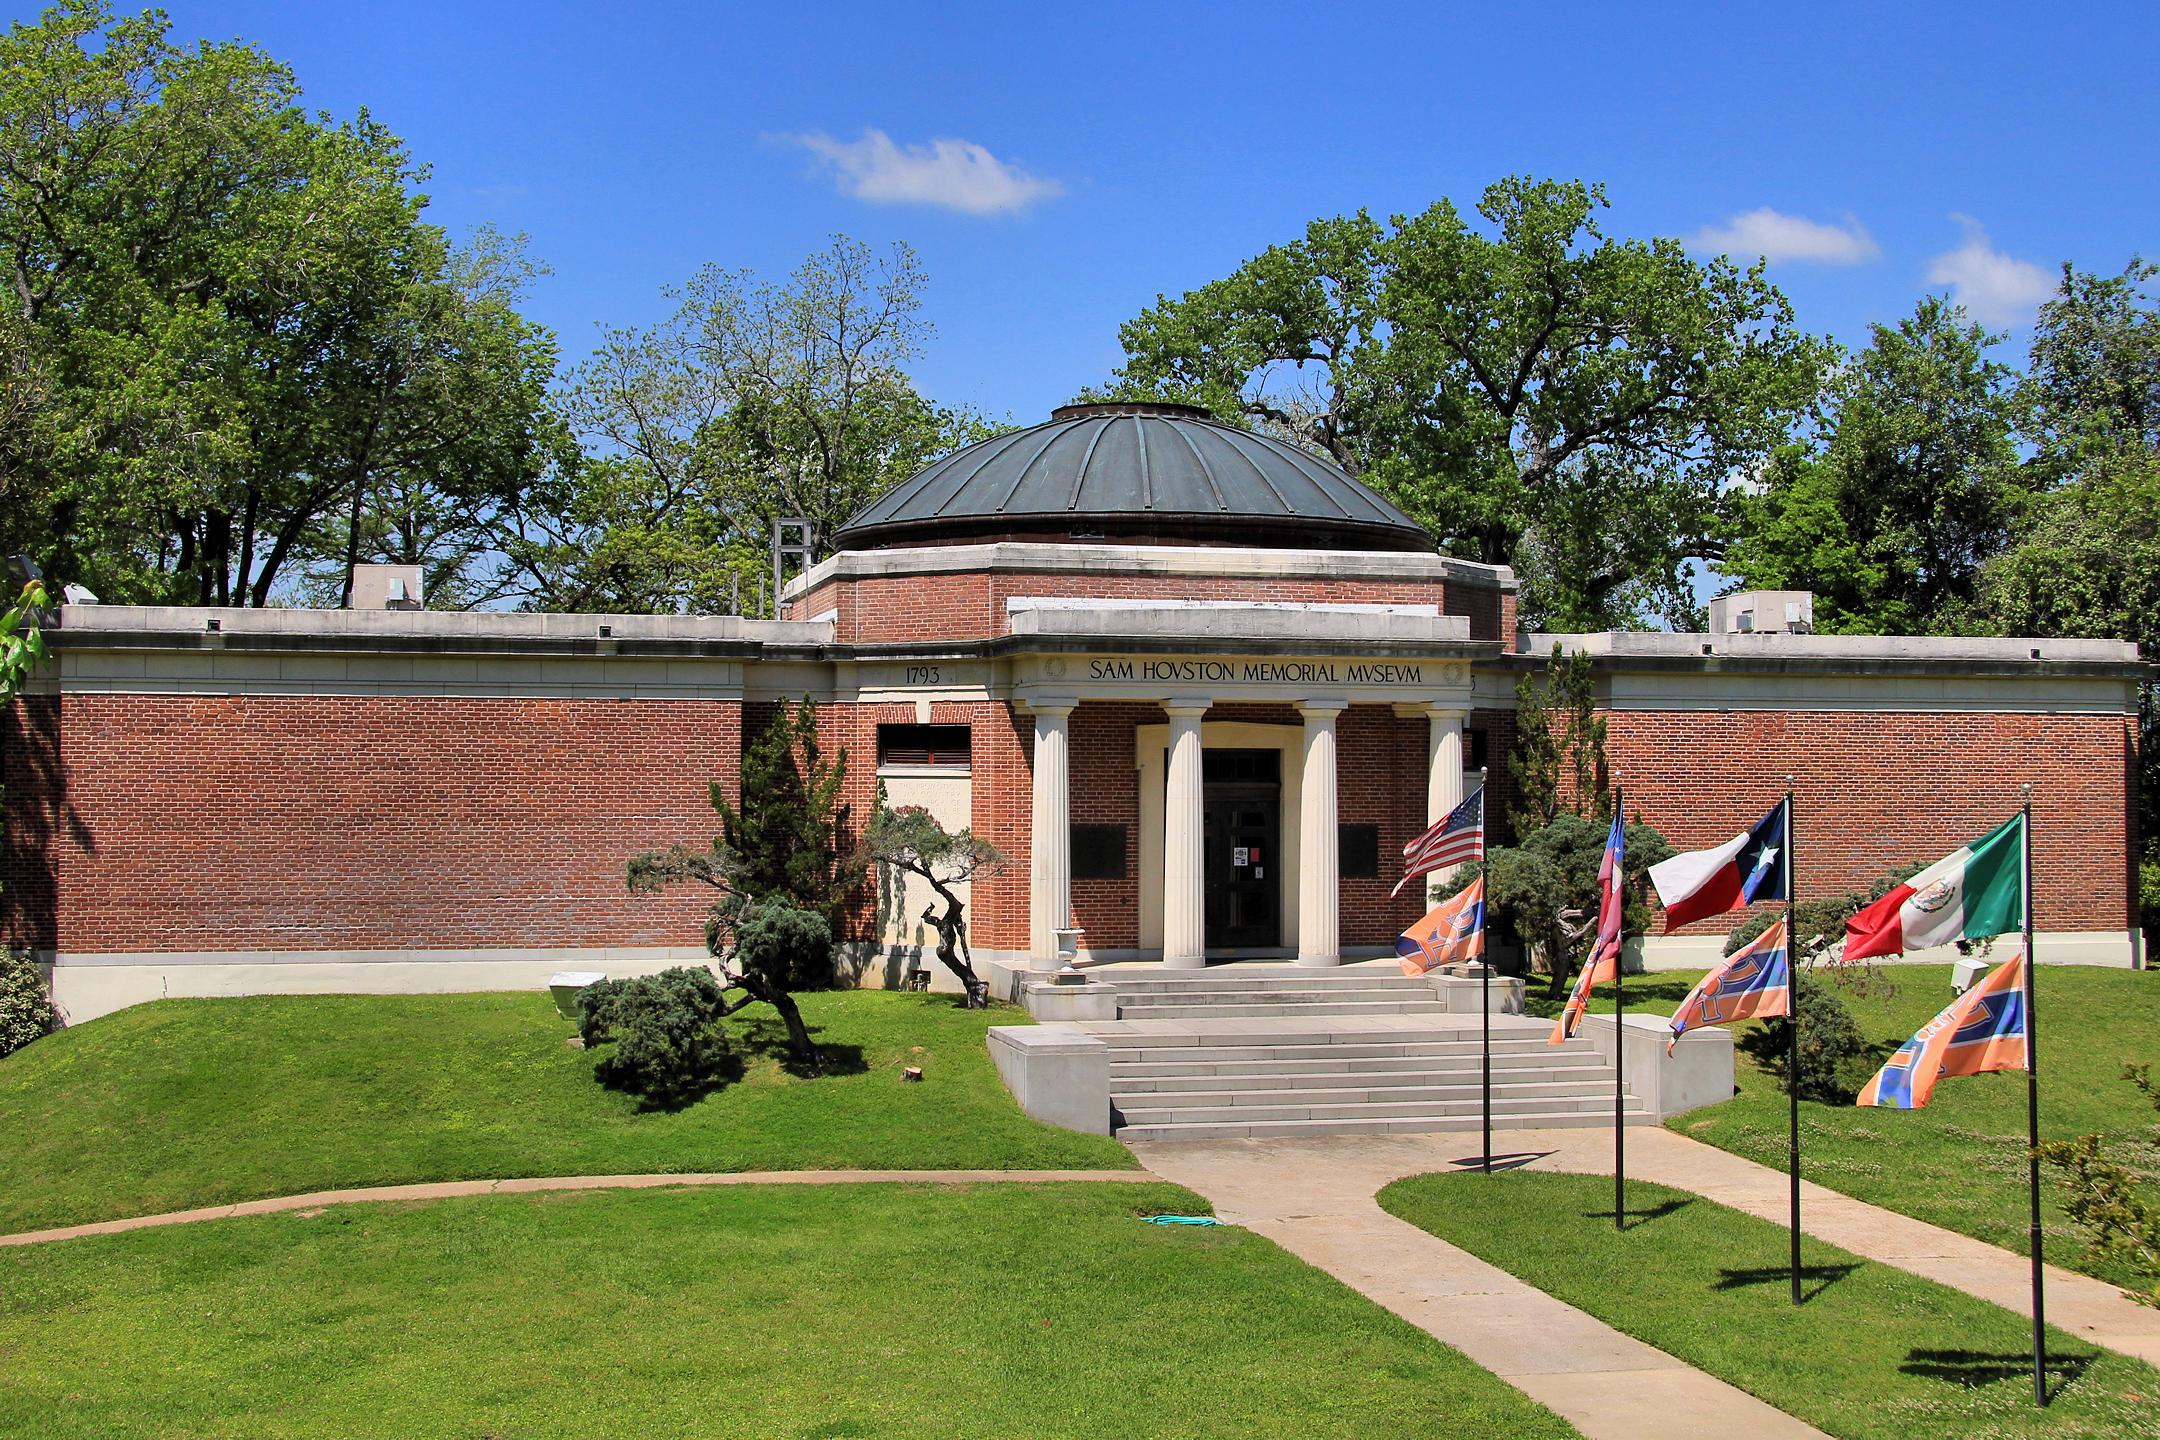 Sam Houston Memorial Museum